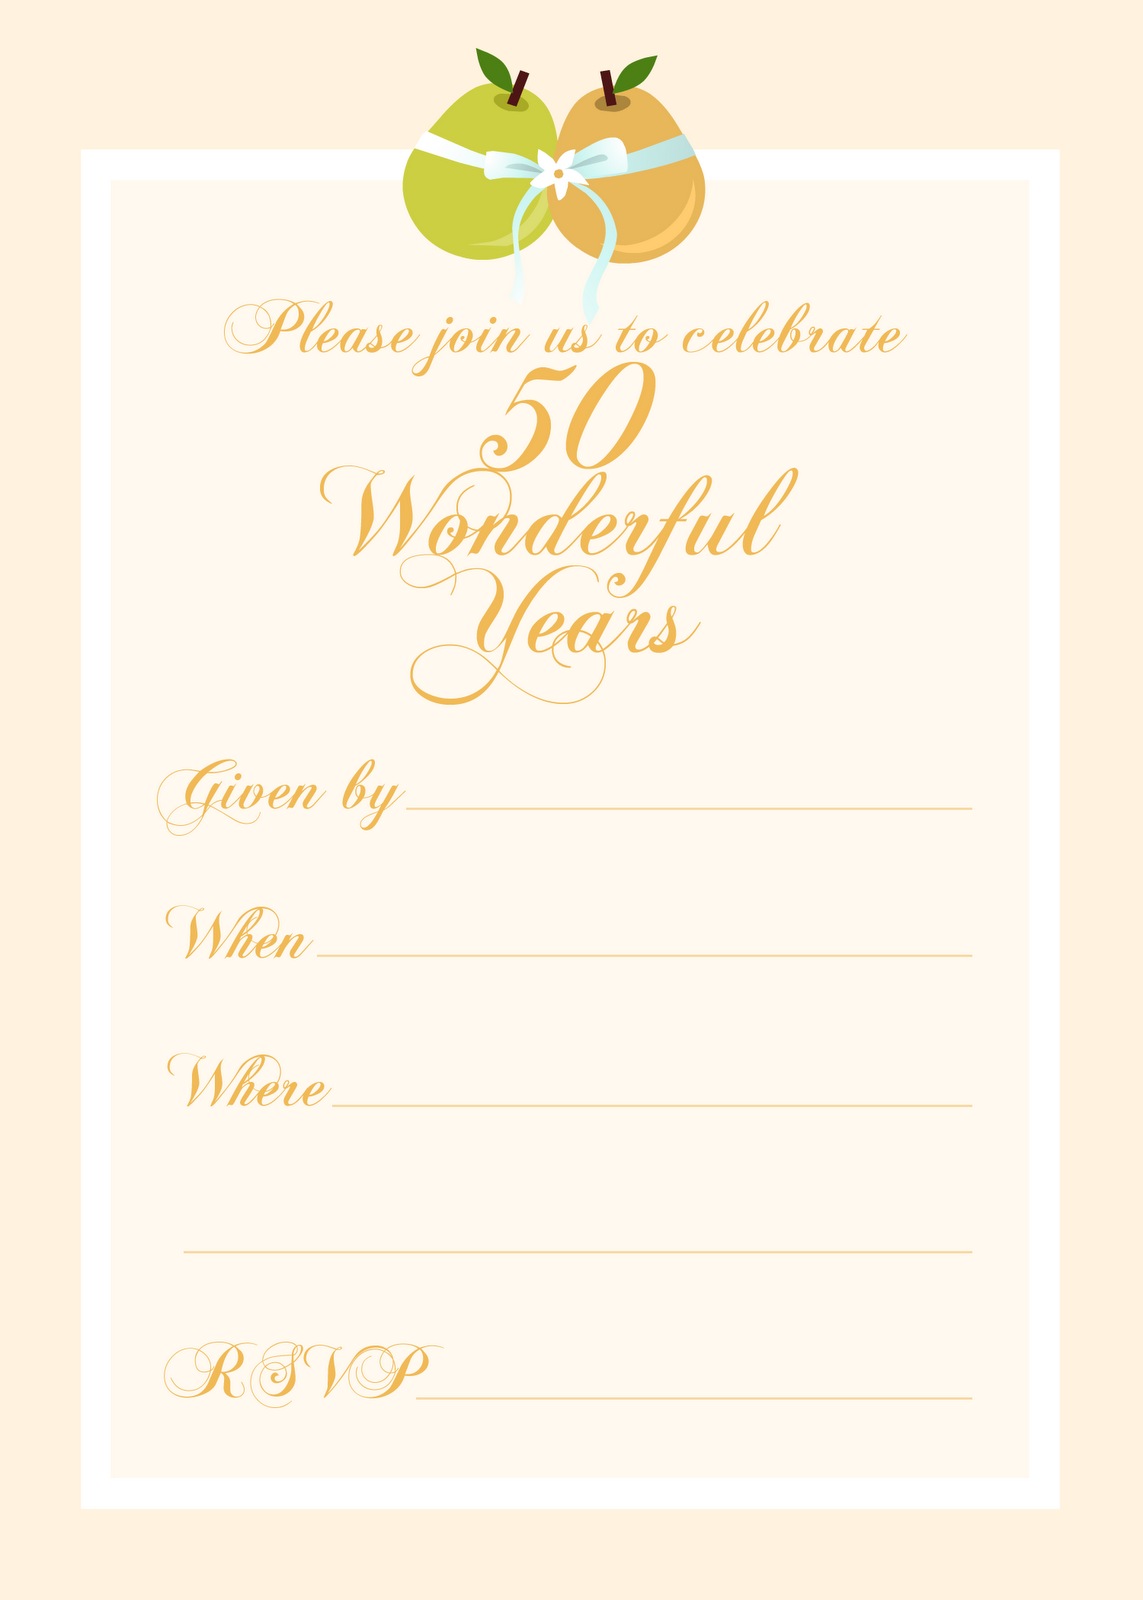 free silver wedding anniversary clipart - photo #25